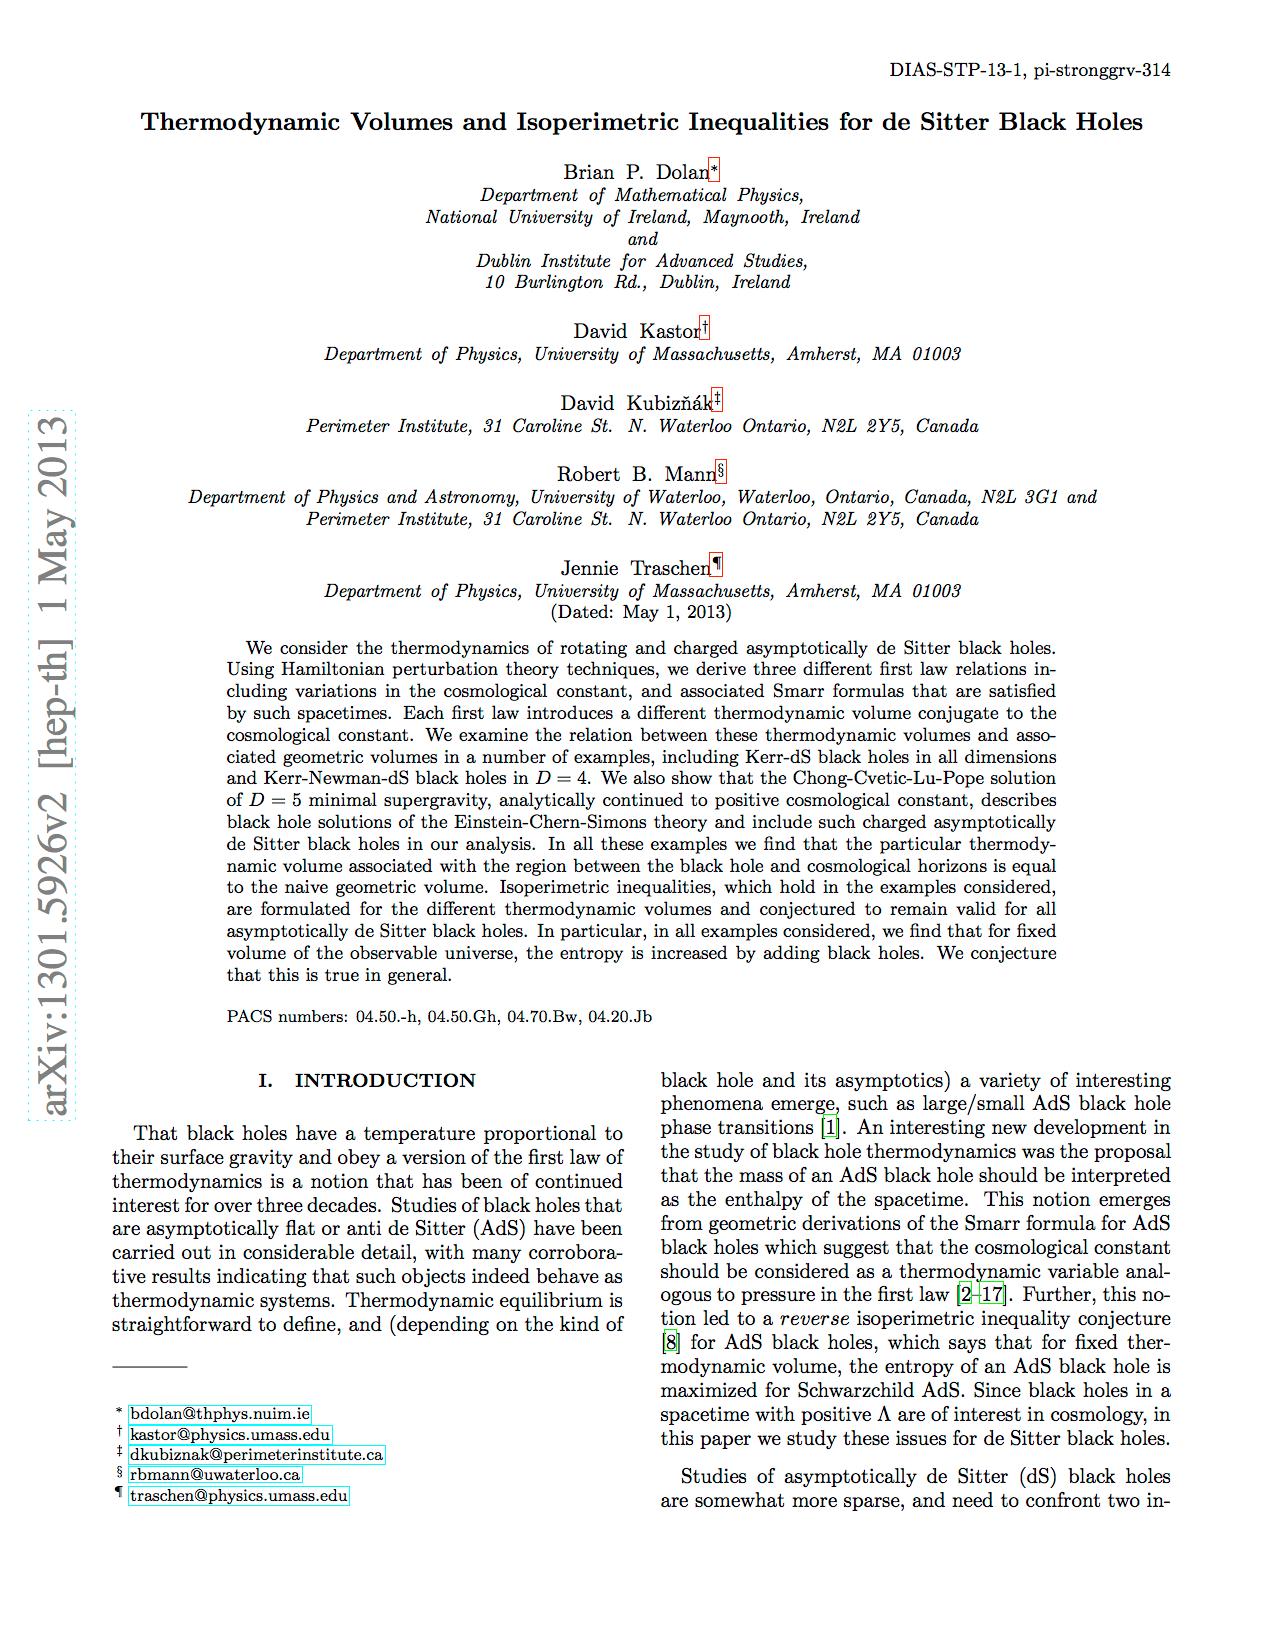 David Kastor Department Of Physics Umass Amherst